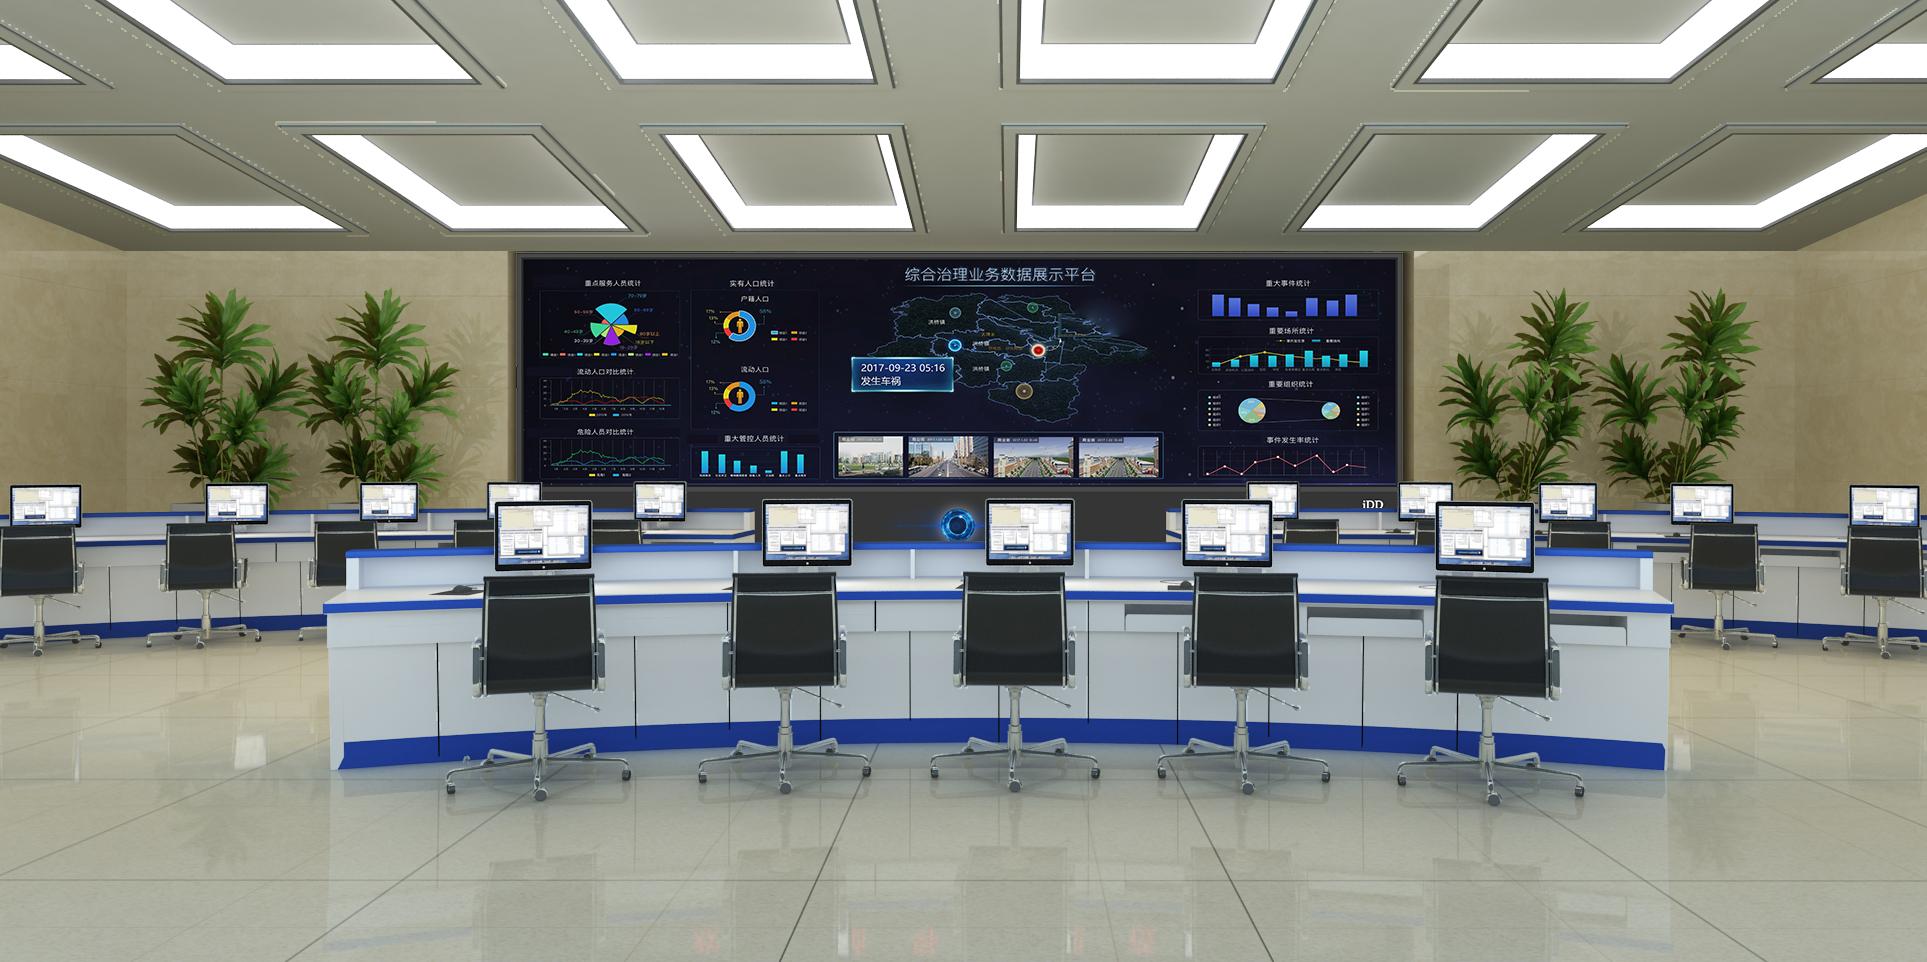 iDD智能显示系统在应急指挥中心的应用